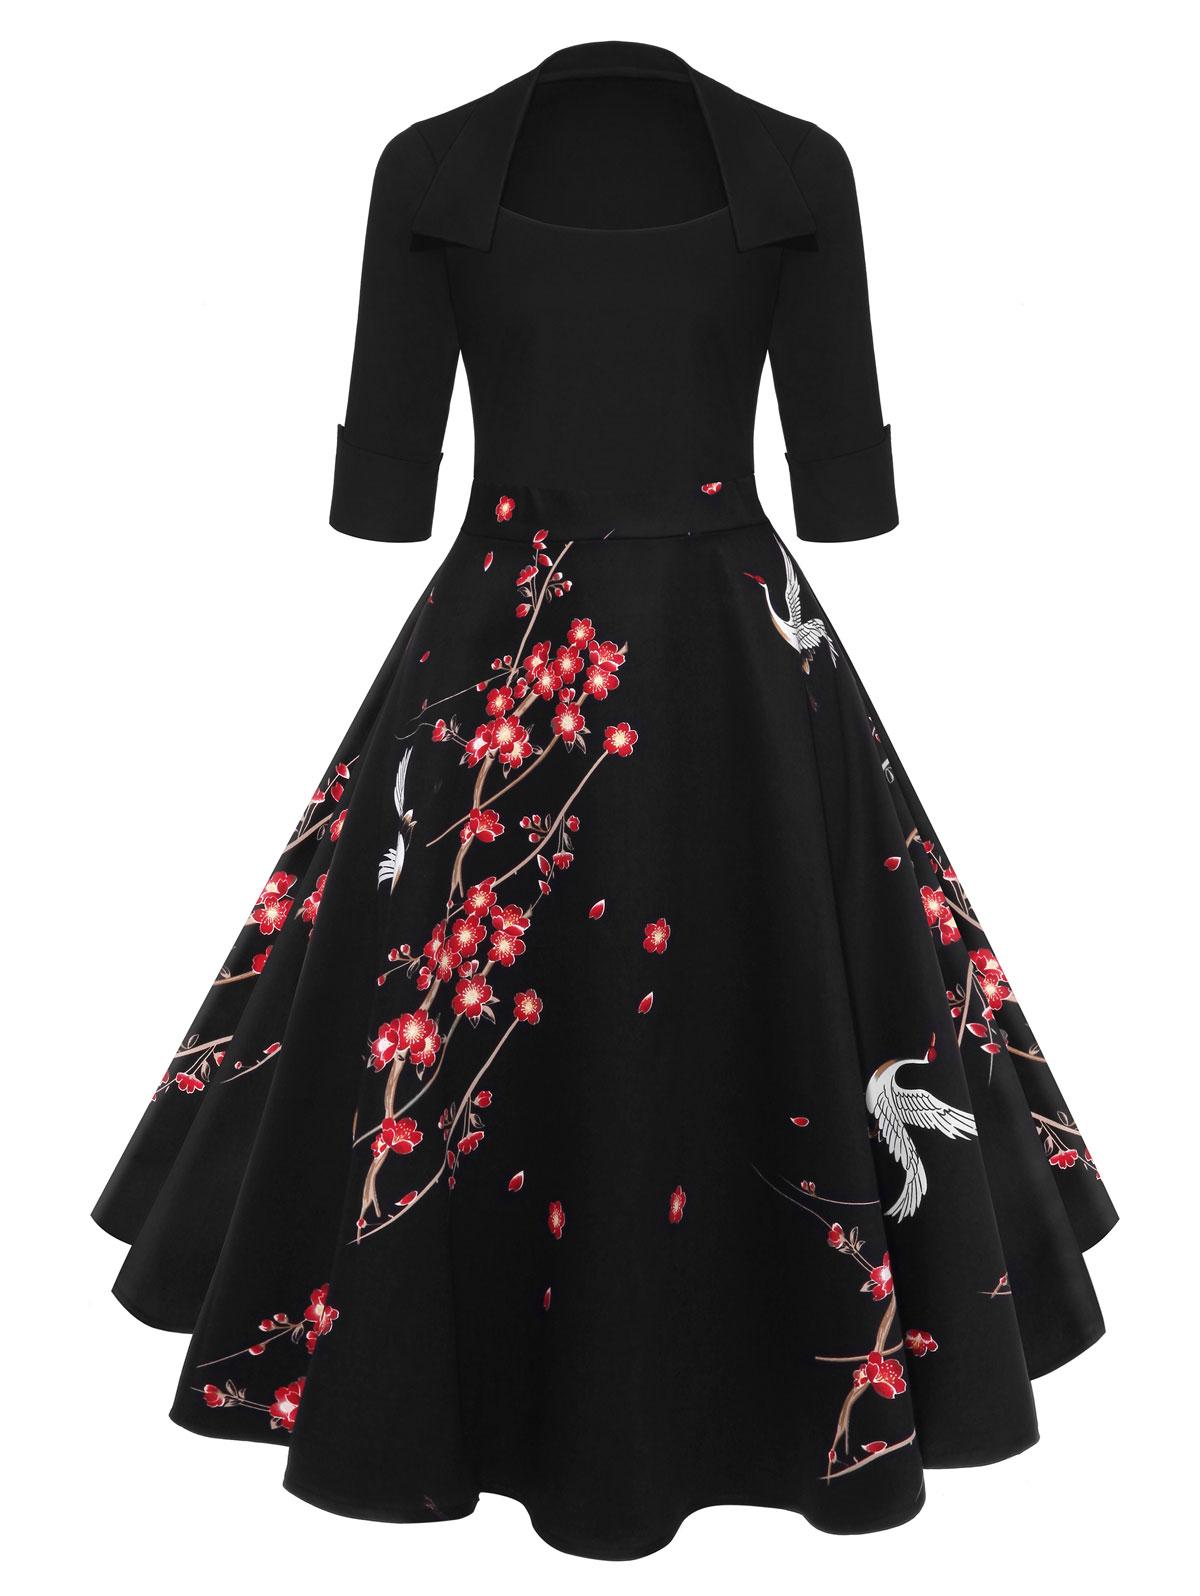 67e9b635cb9c4 US $18.53 40% OFF|AZULINA Audrey Hepburn Vintage Party Dress Women Floral  Flare Midi Dresses Winter Autumn Retro Elegant Dress Vestidos Robe Femme-in  ...